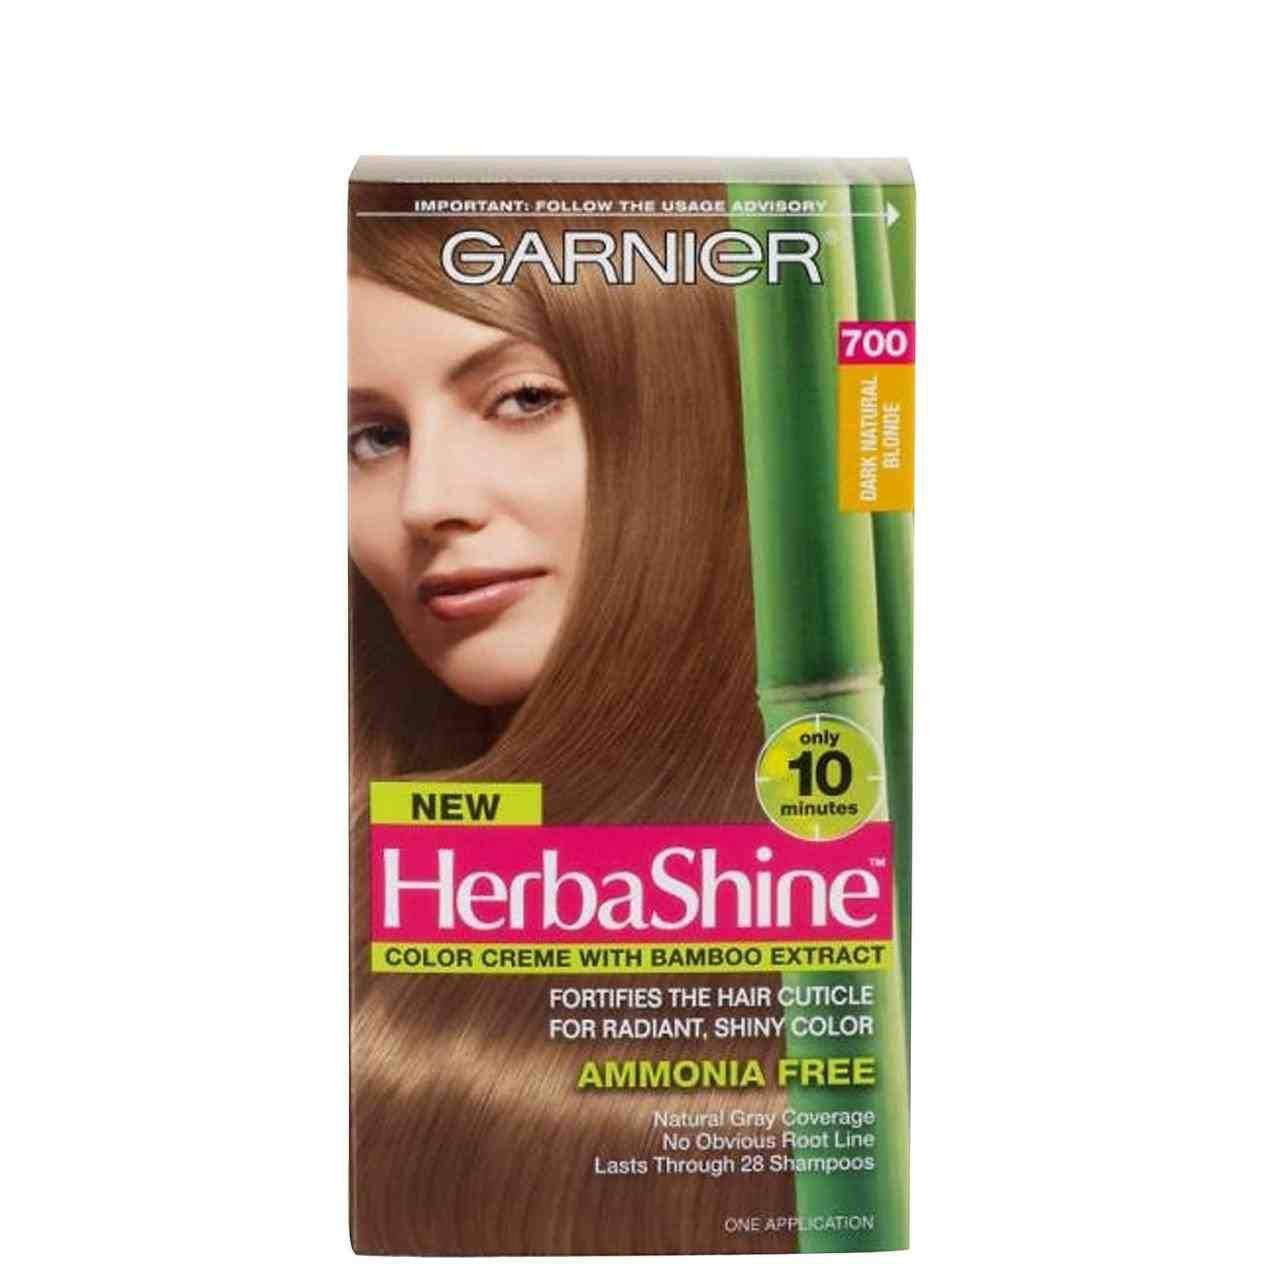 Rose Gold Hair Color Brand Hair Color Permanent Hair Color Men